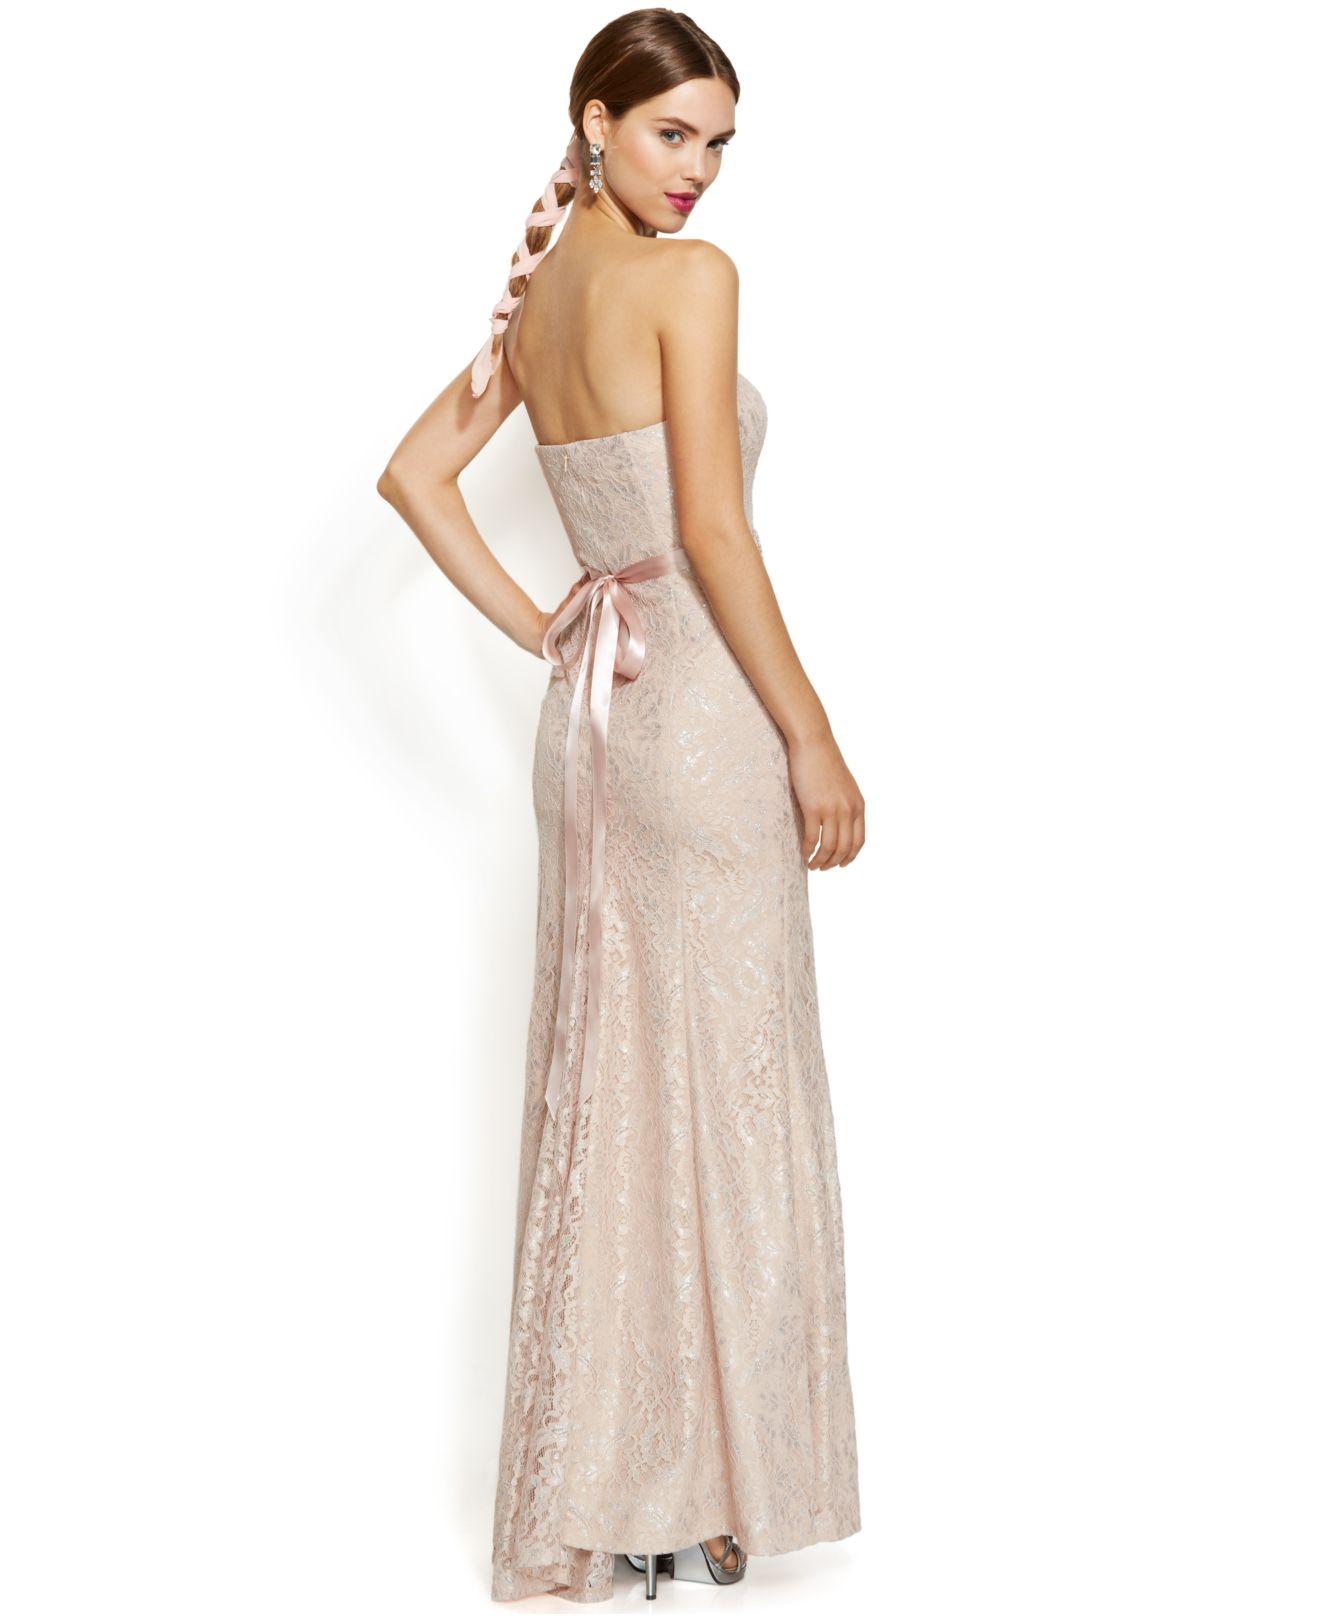 e59d8dedd1f Lyst - Betsy   Adam Strapless Metallic-Lace Mermaid Gown in Pink